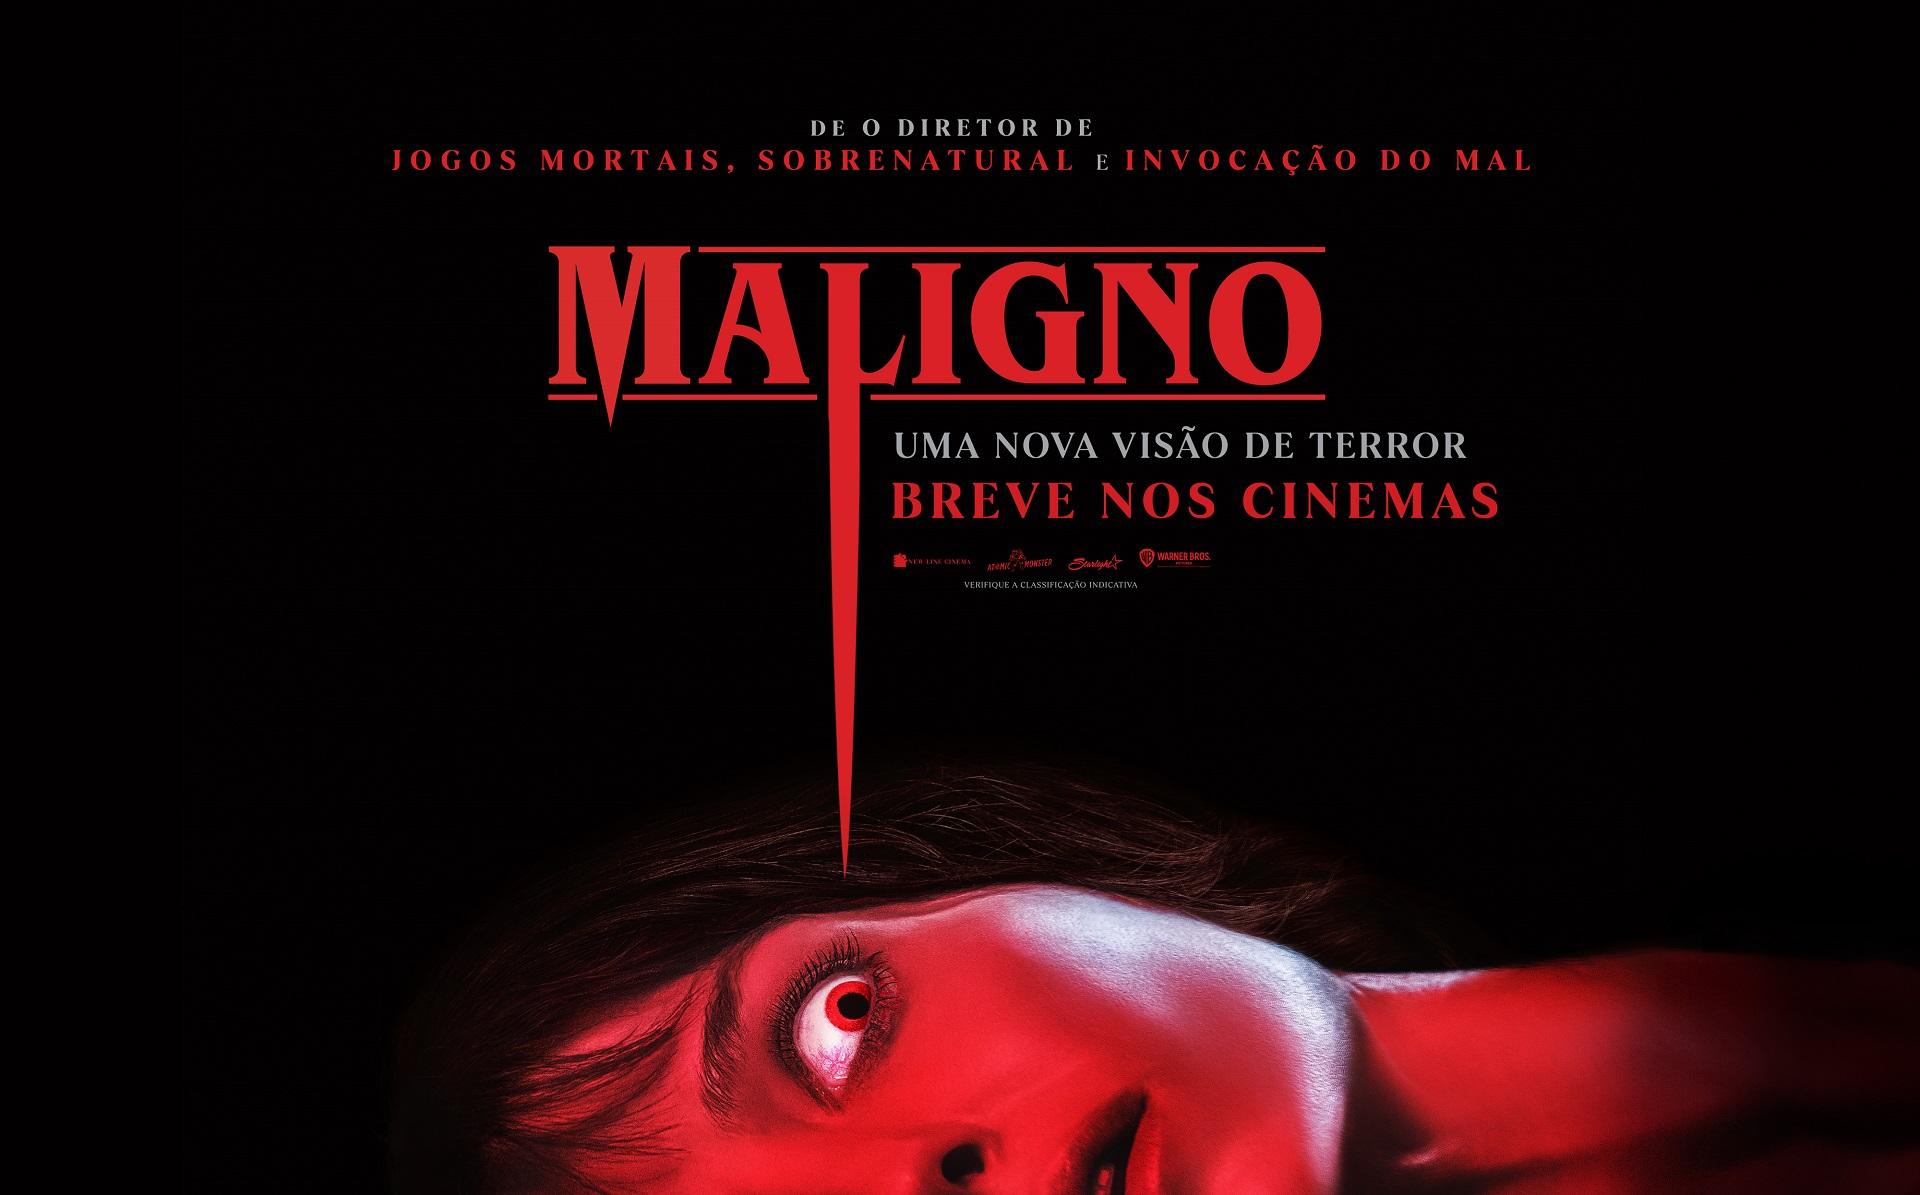 maligno-filme-terror-james-wan-warner-2